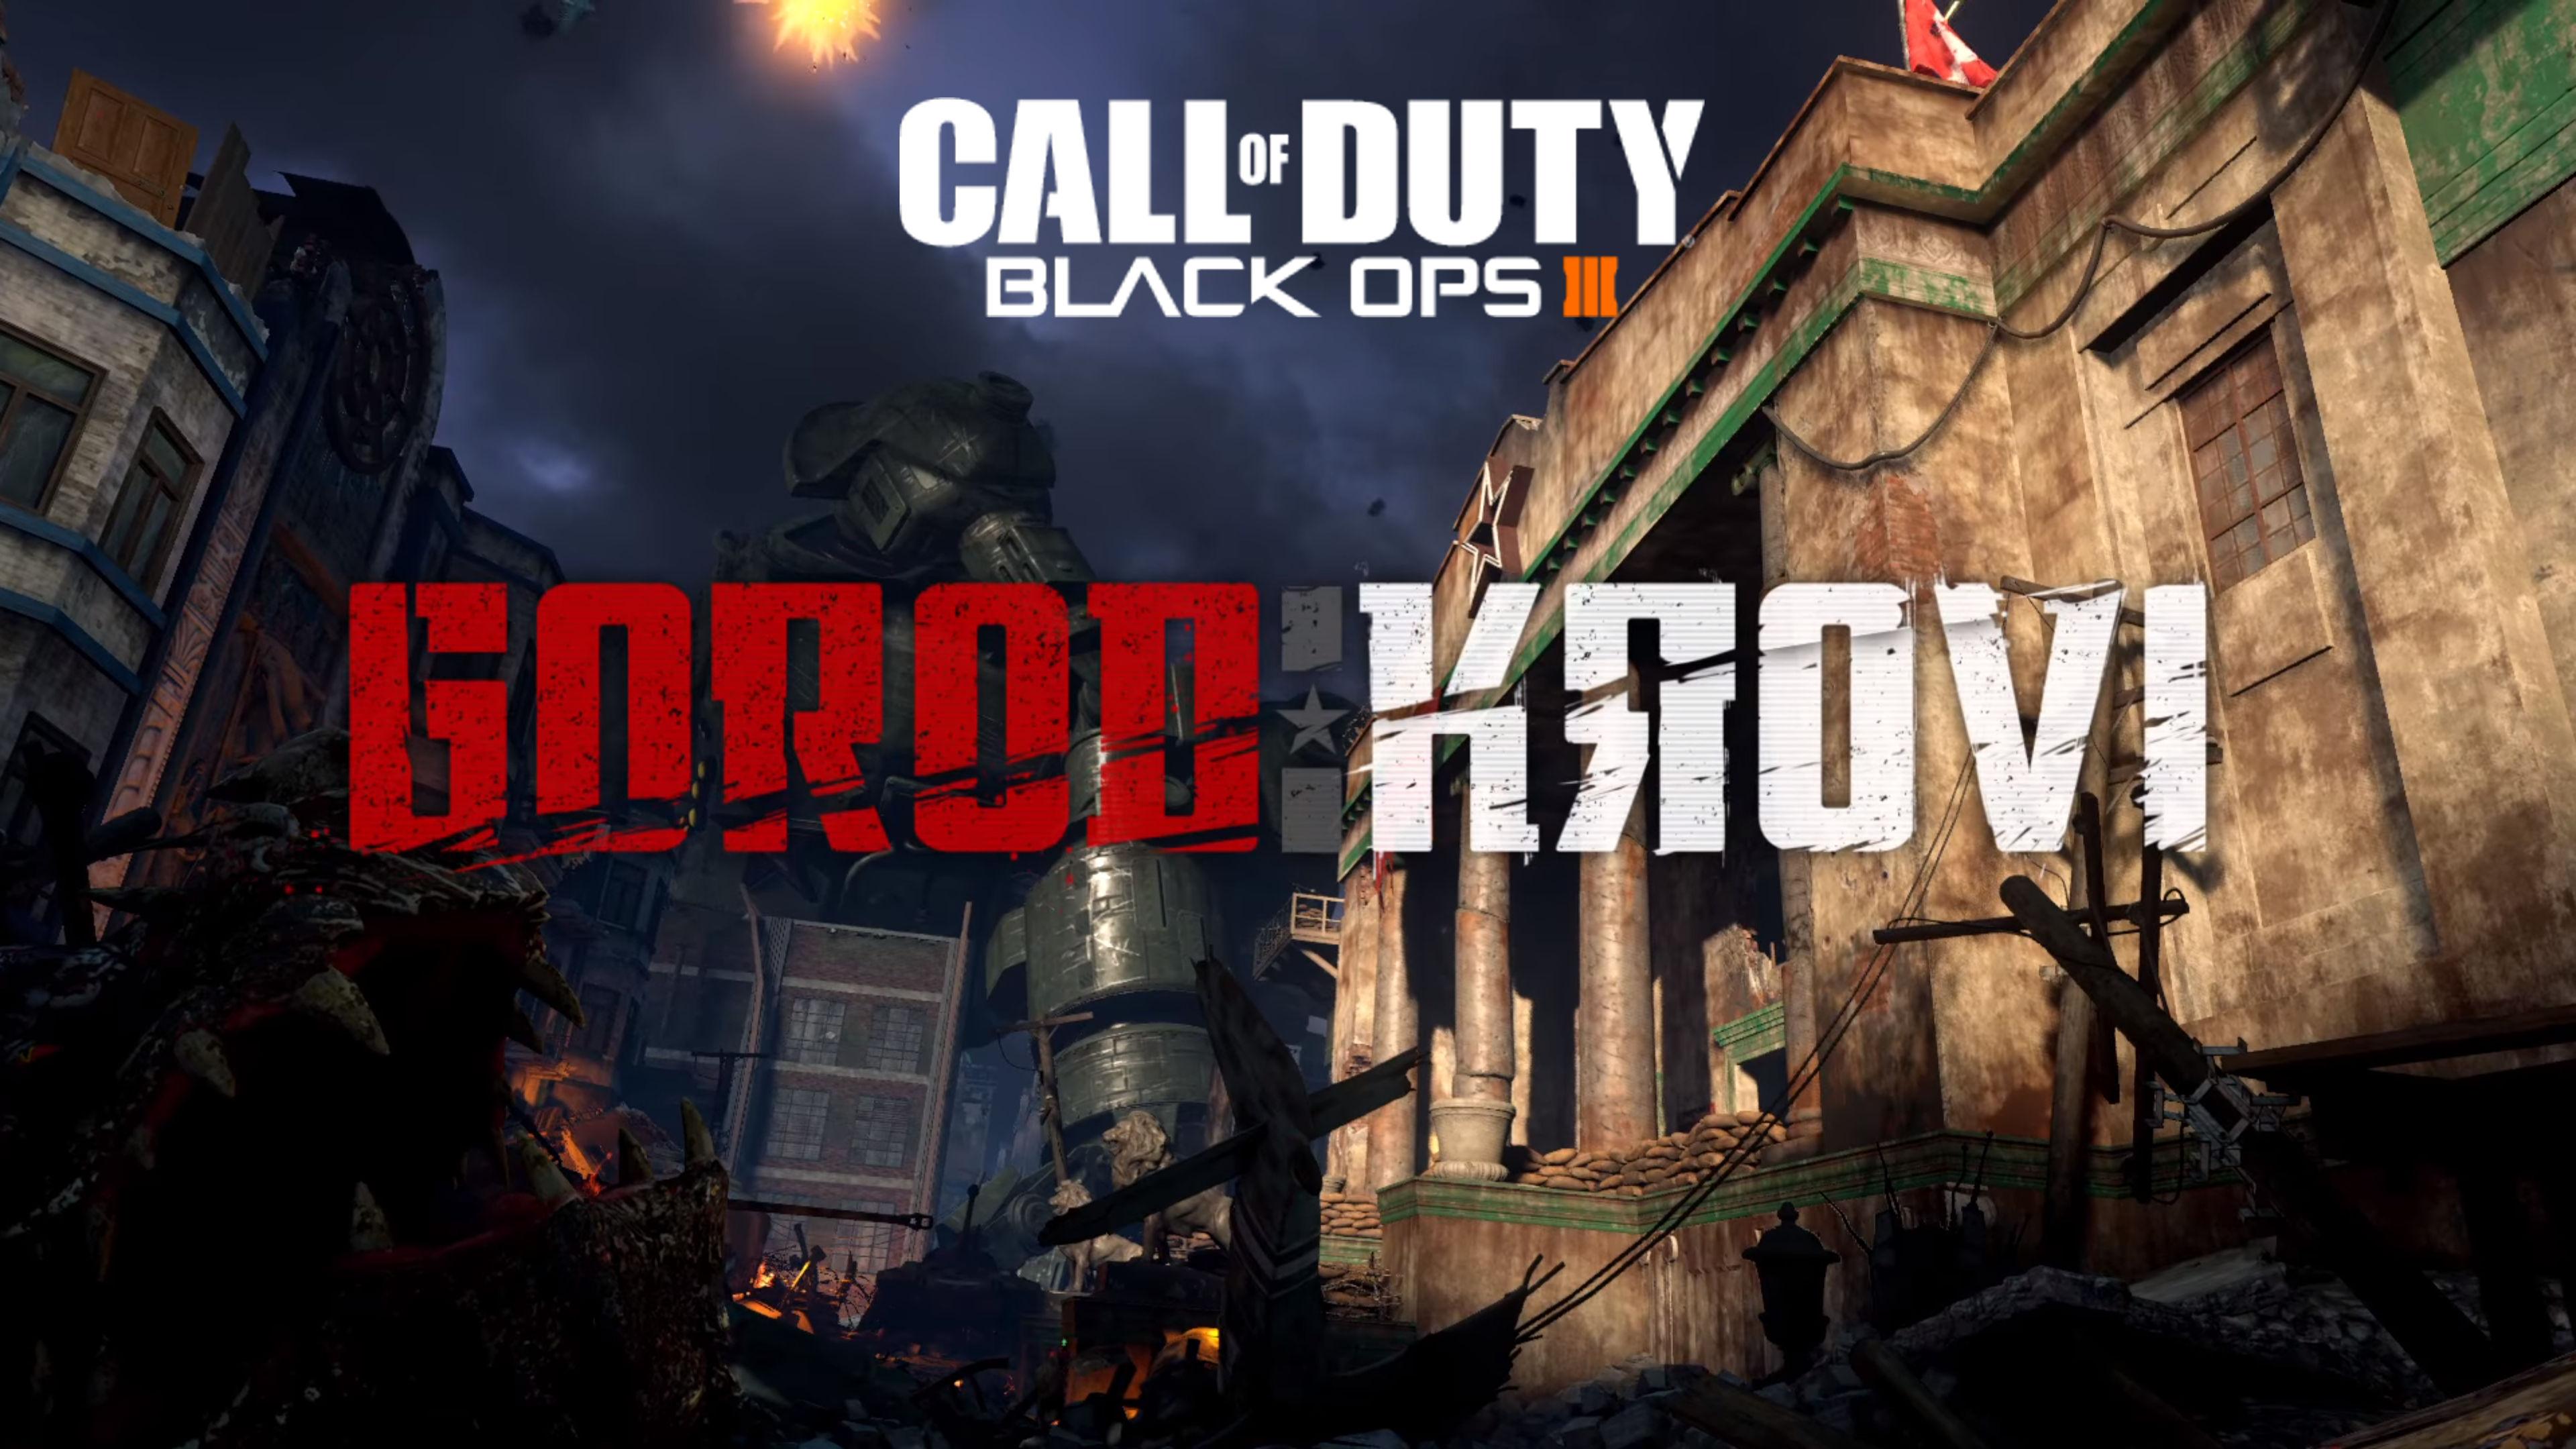 Call Of Duty Black Ops 3 Descent Gorod Krovi Guide